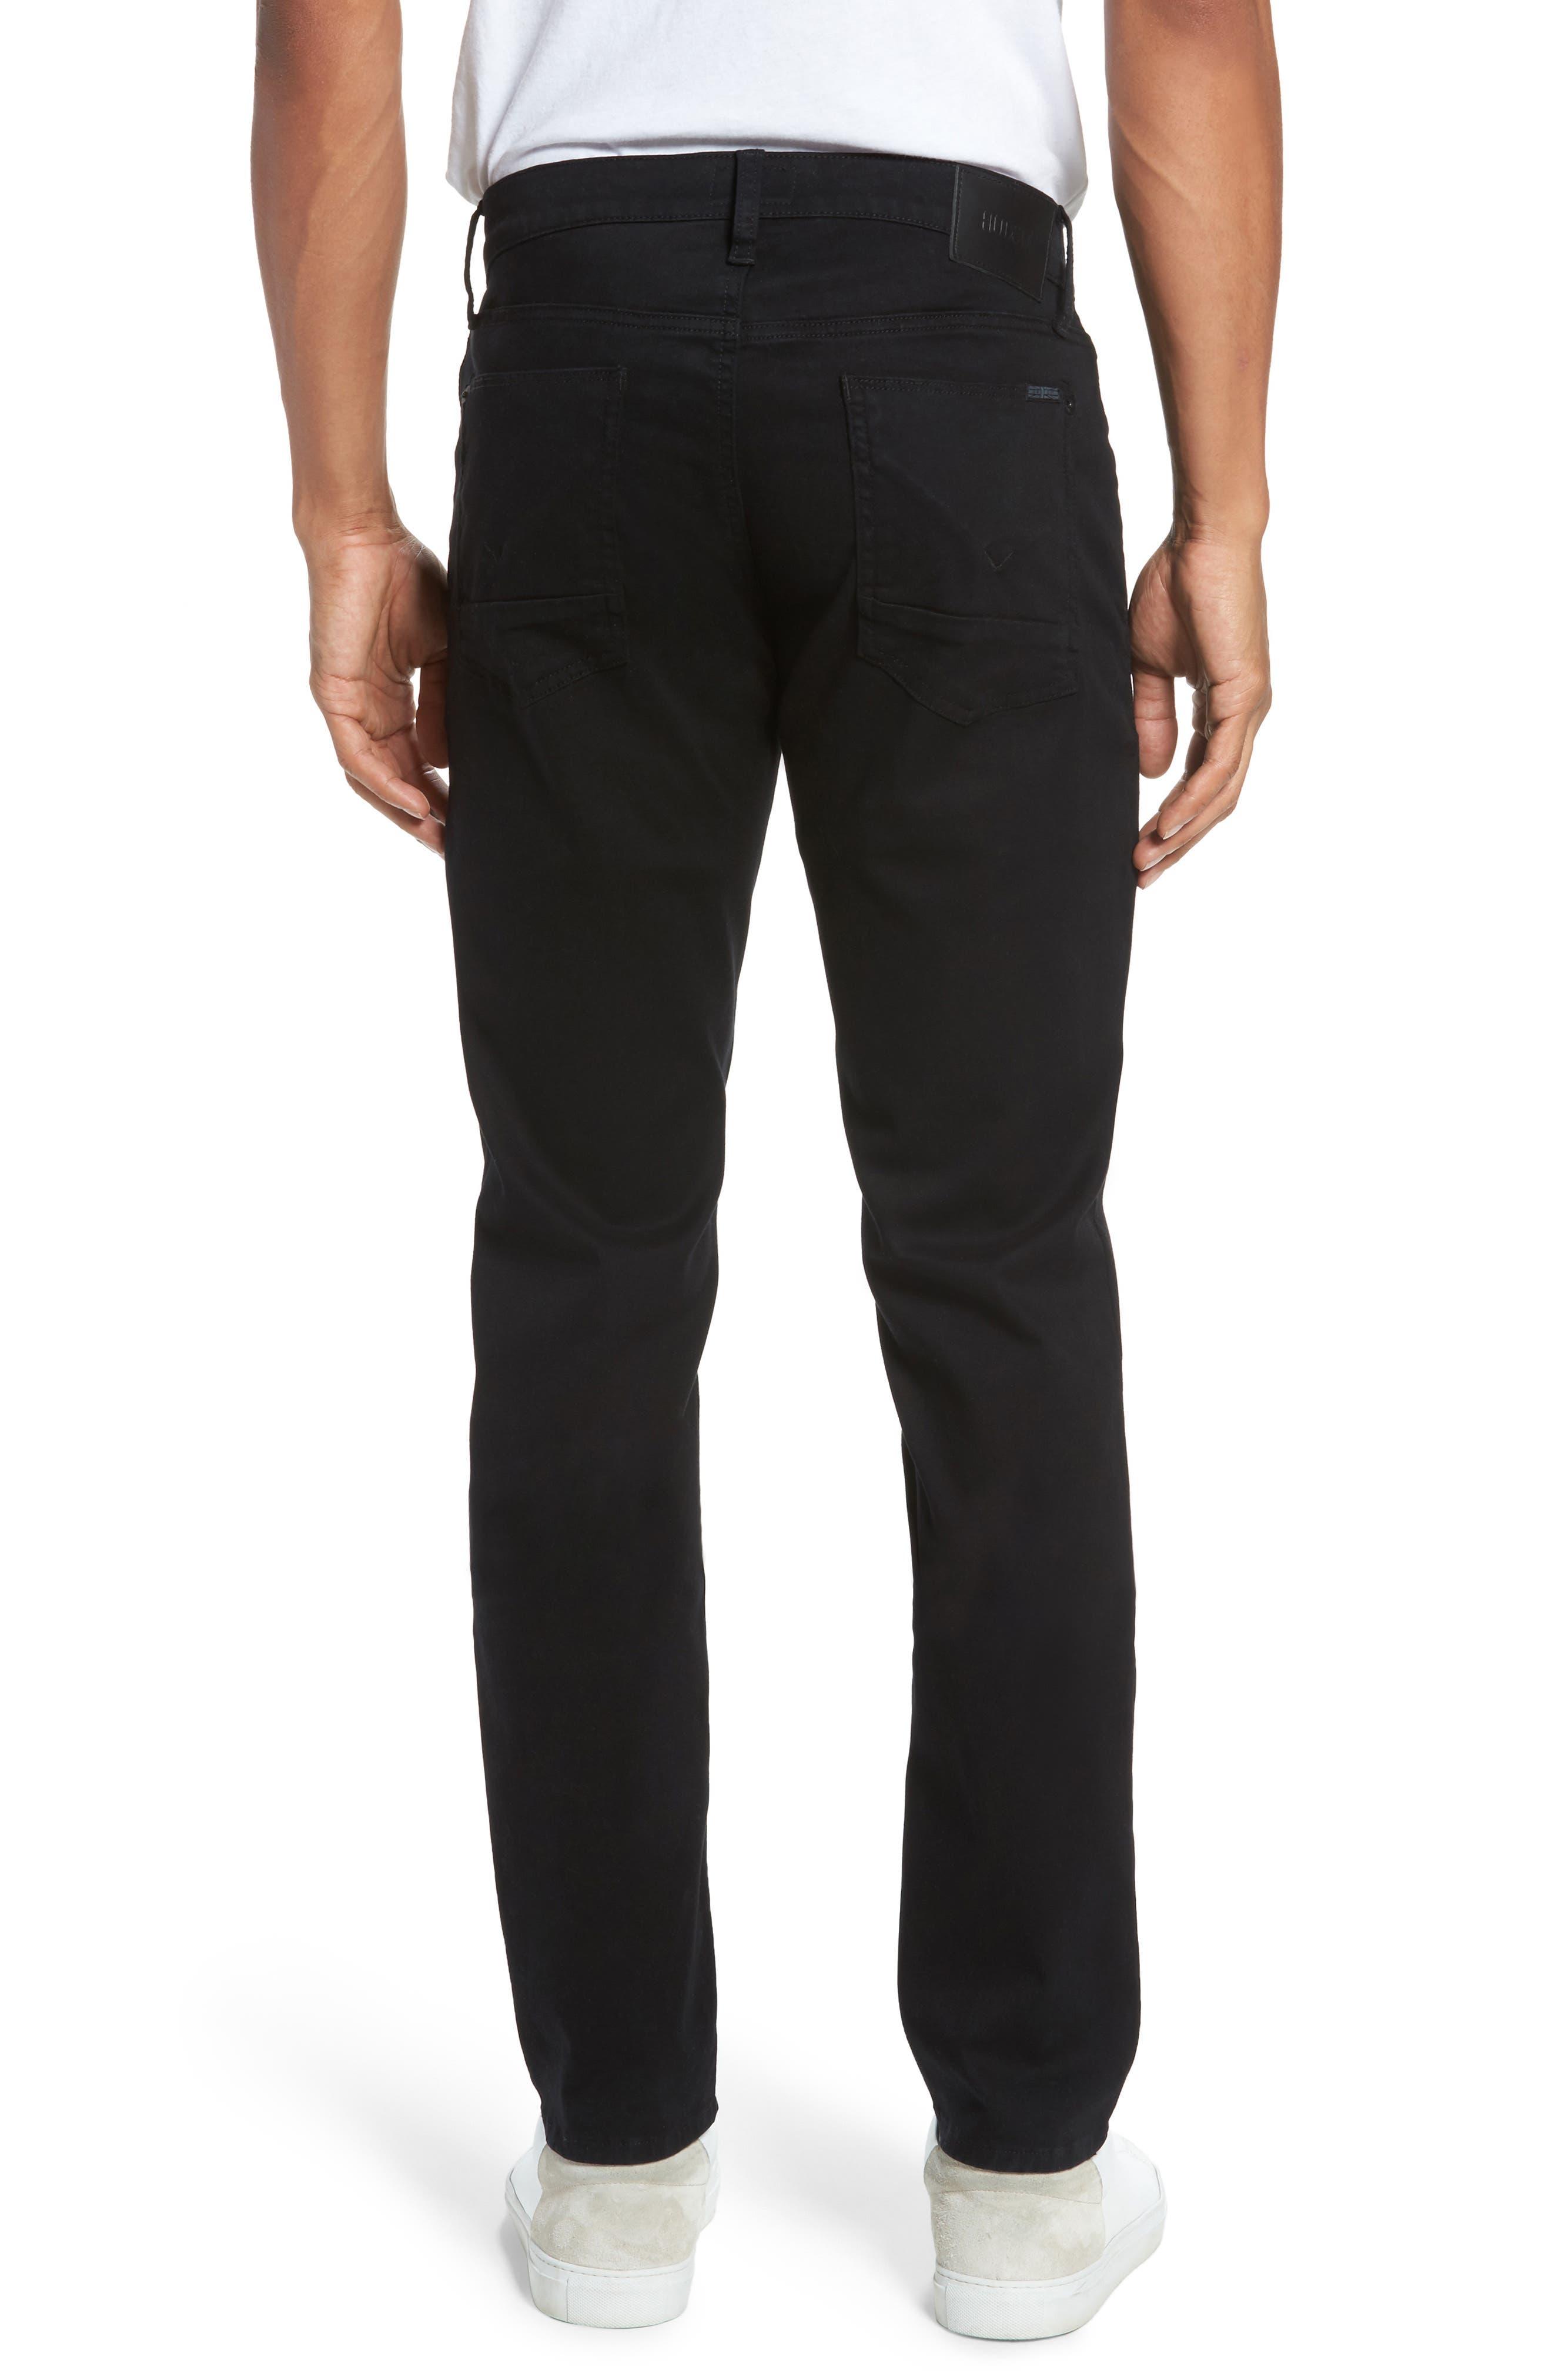 Alternate Image 2  - Hudson Jeans Blake Slim Fit Jeans (Blackened)